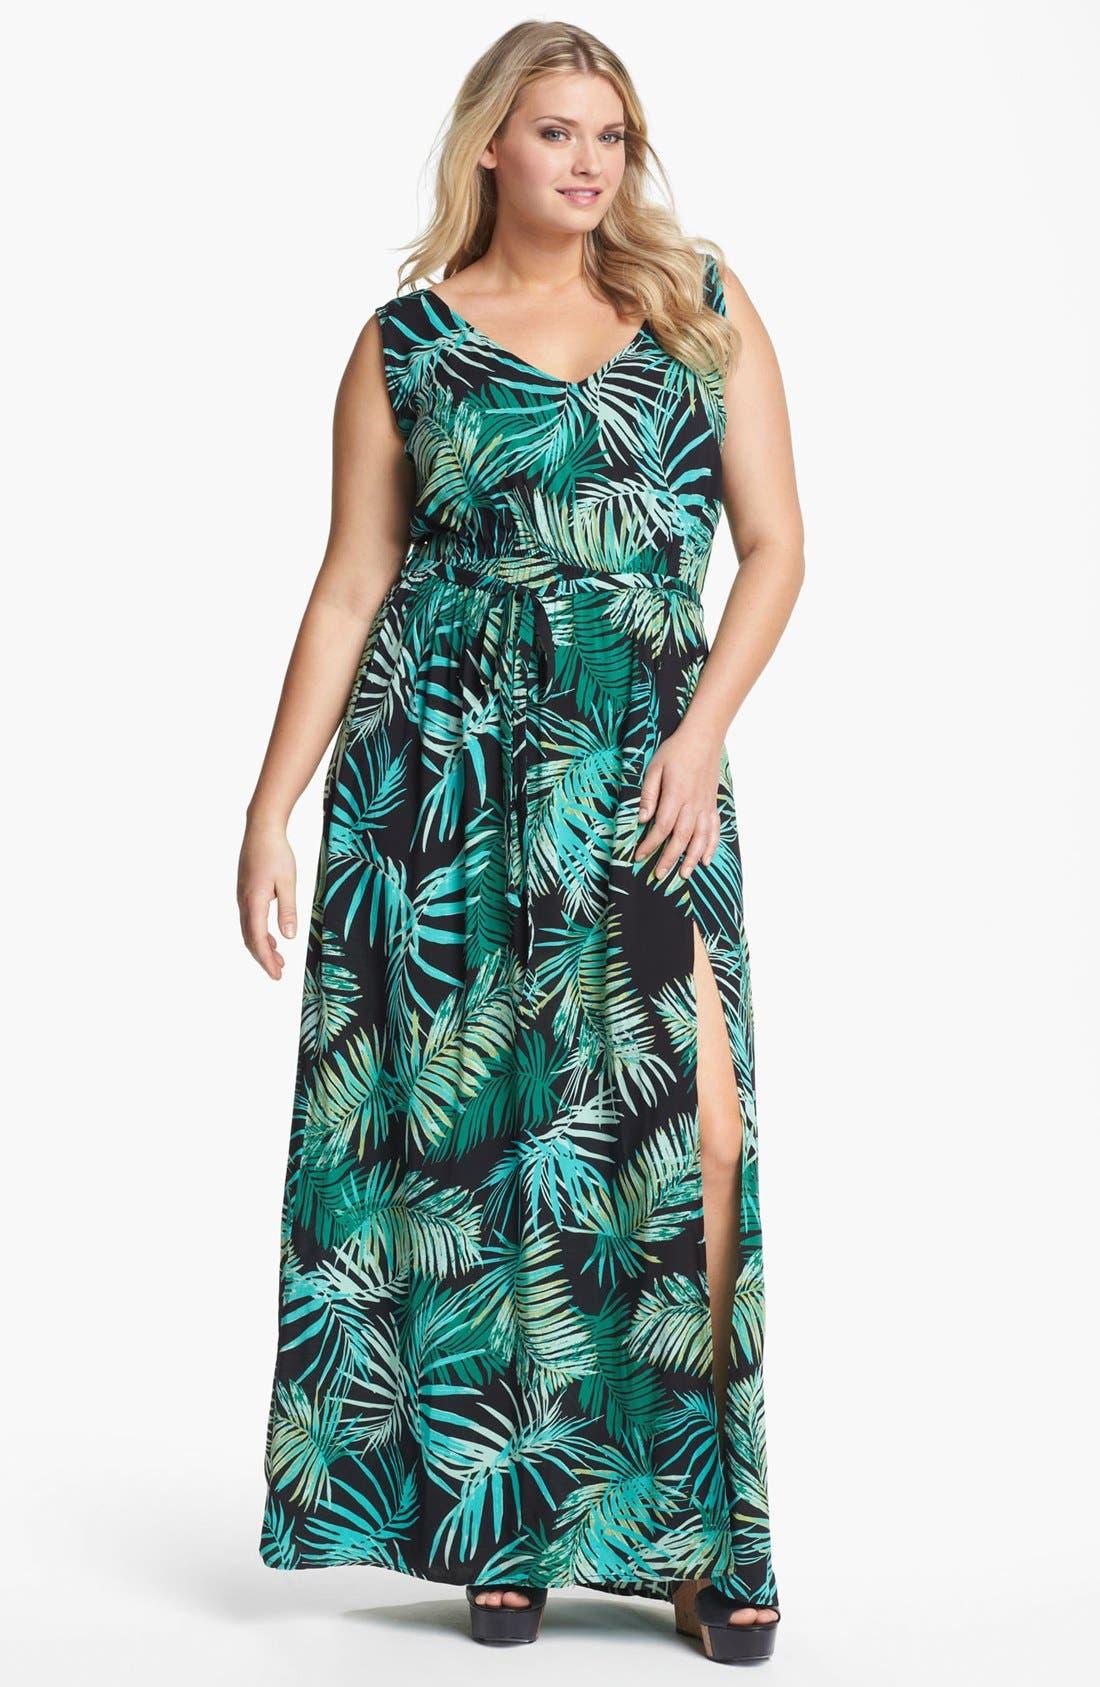 Alternate Image 1 Selected - Eight Sixty Print Sleeveless Maxi Dress (Plus Size)